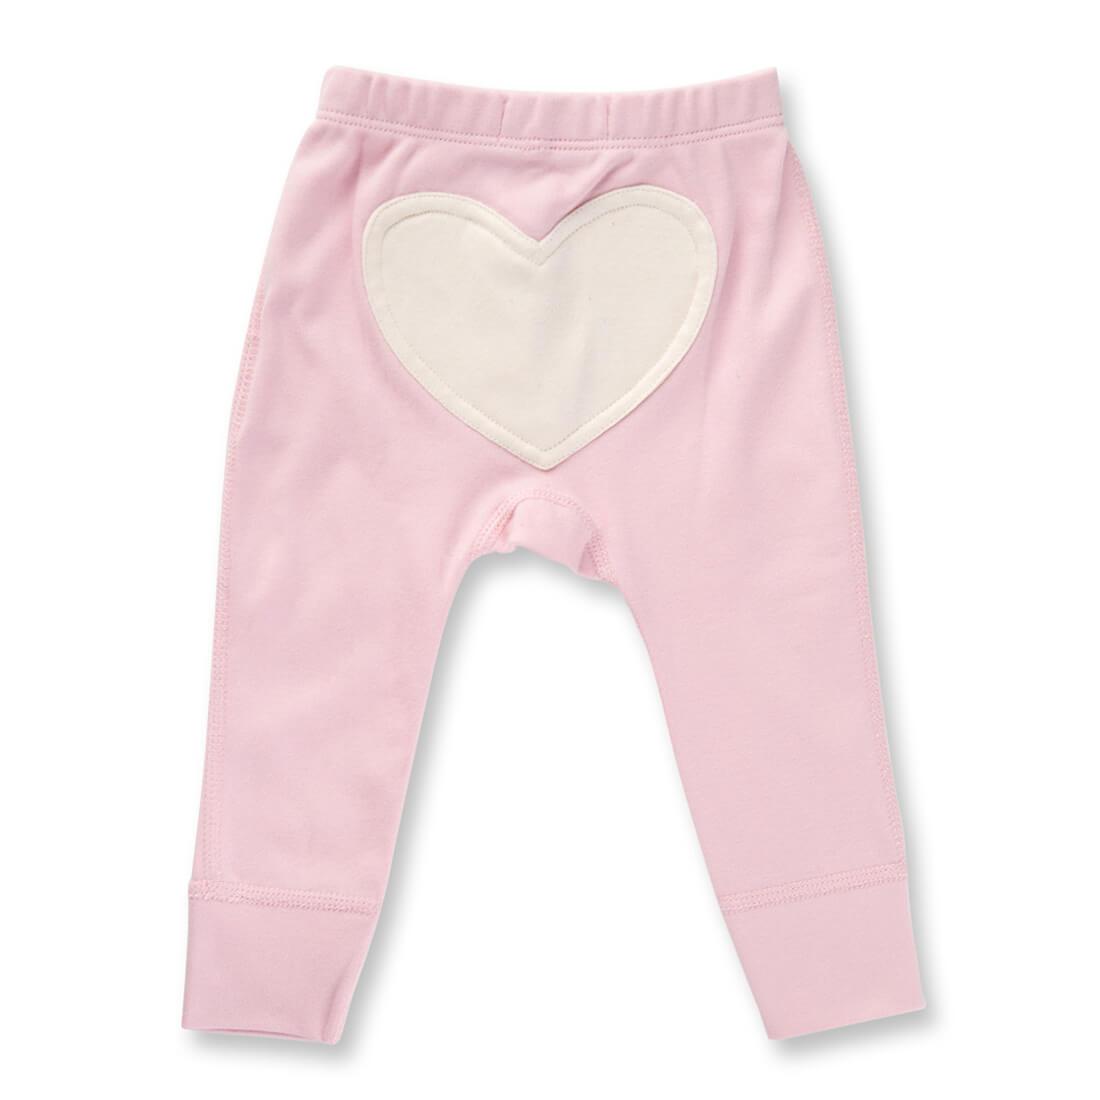 Sapling Child Dusty Pink Heart Pants